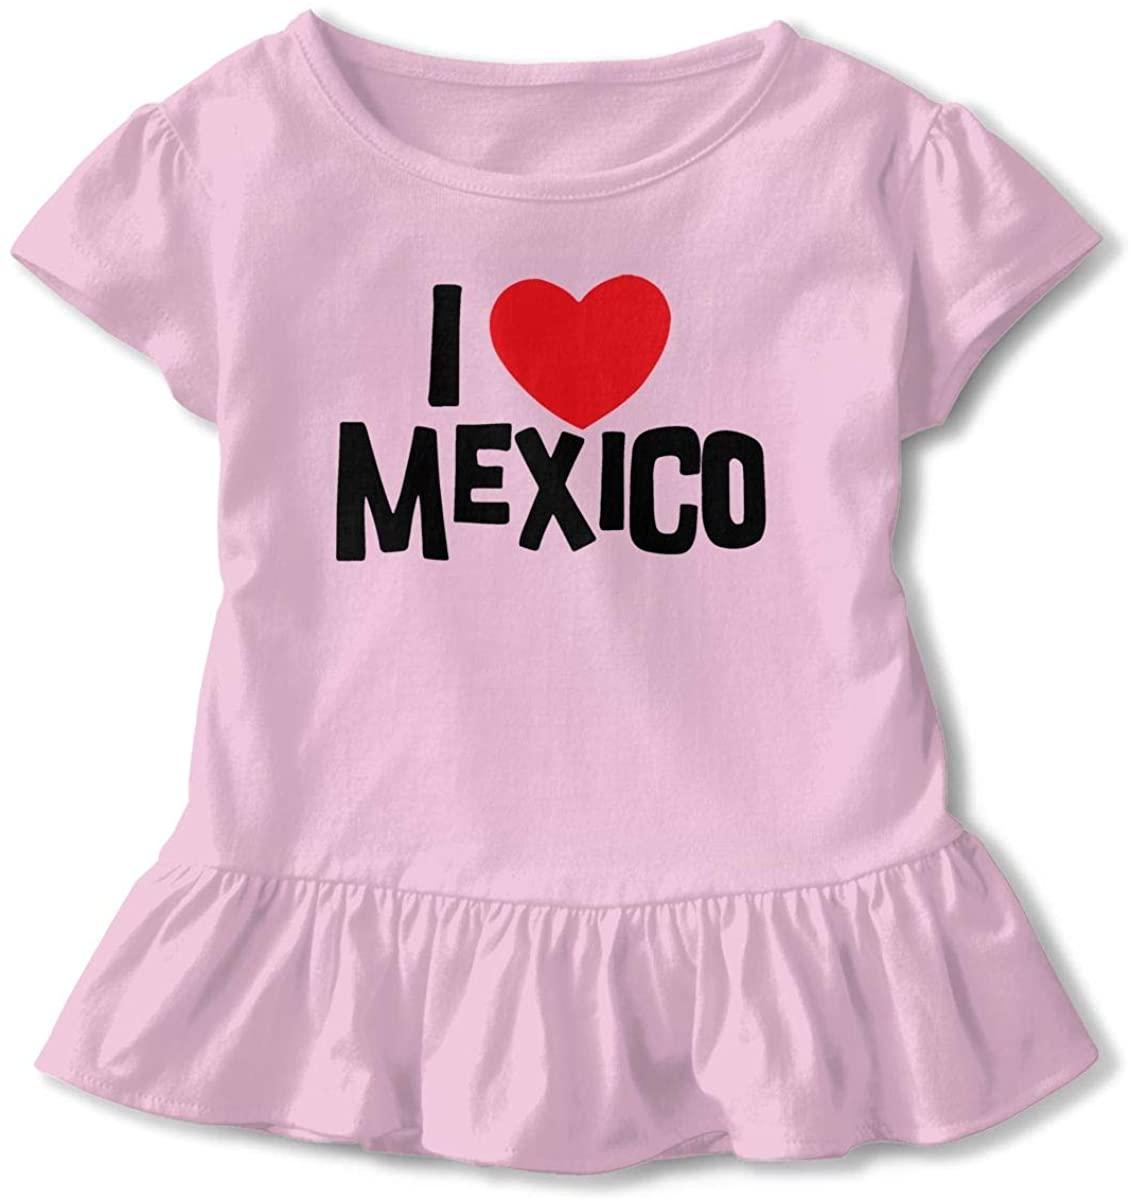 I Love Mexico Little Girls Cotton Casual Print Short Sleeve Skirt Dresses 2-6T White